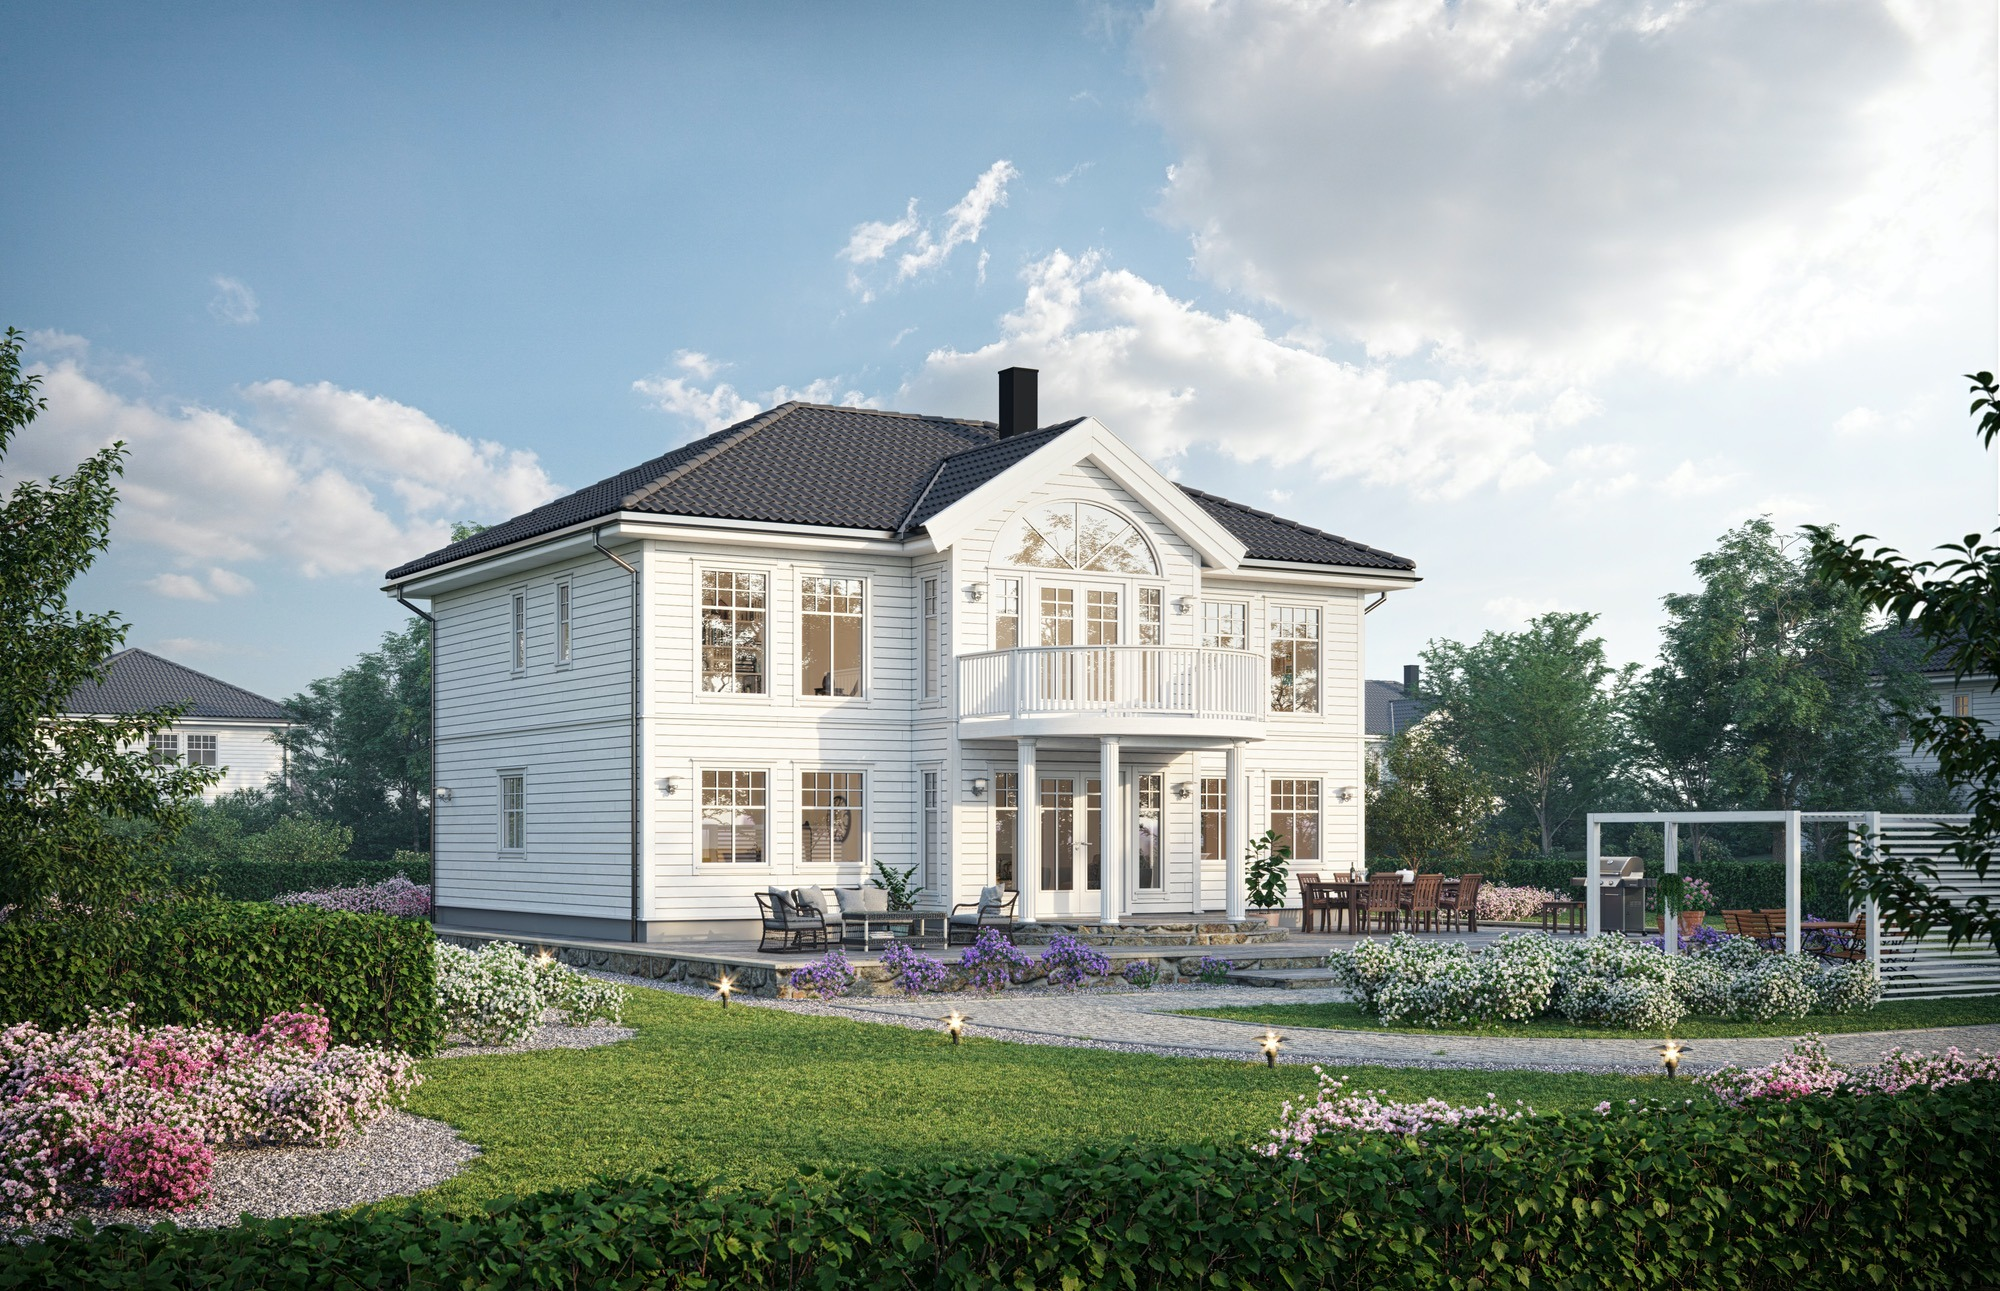 Blink hus Sandviken Hovedperspektiv